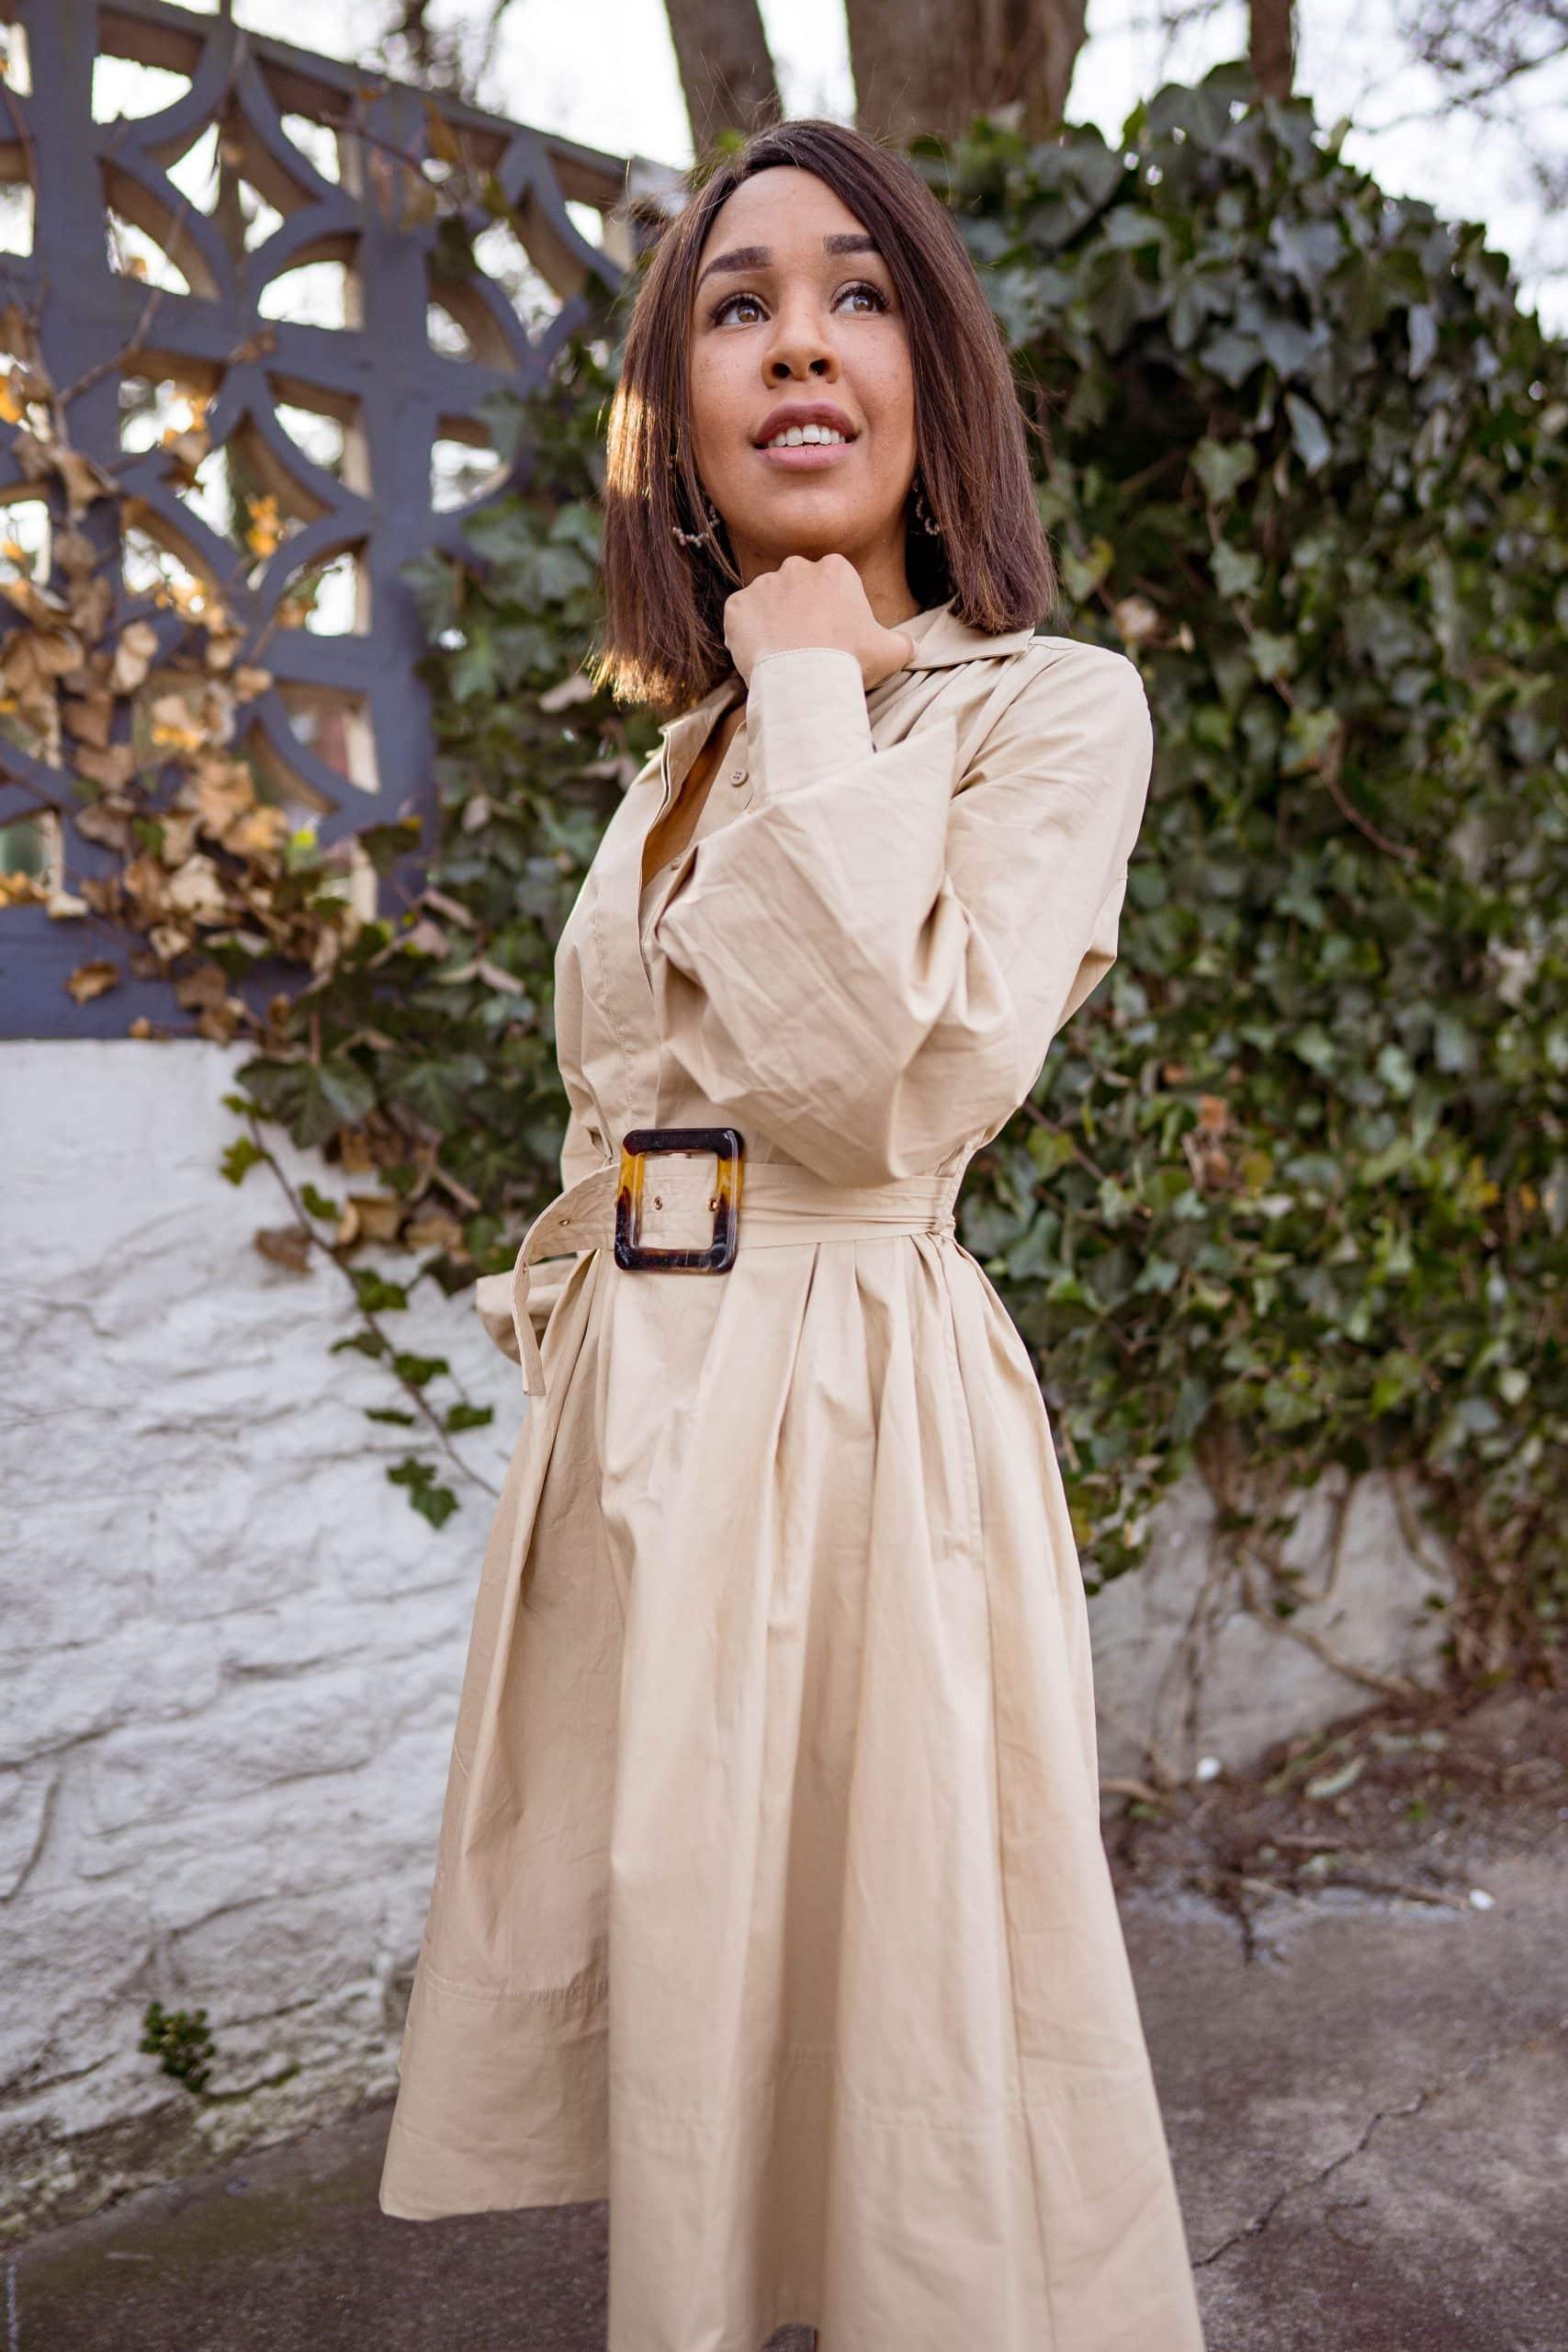 livinglesh jacket like dresses